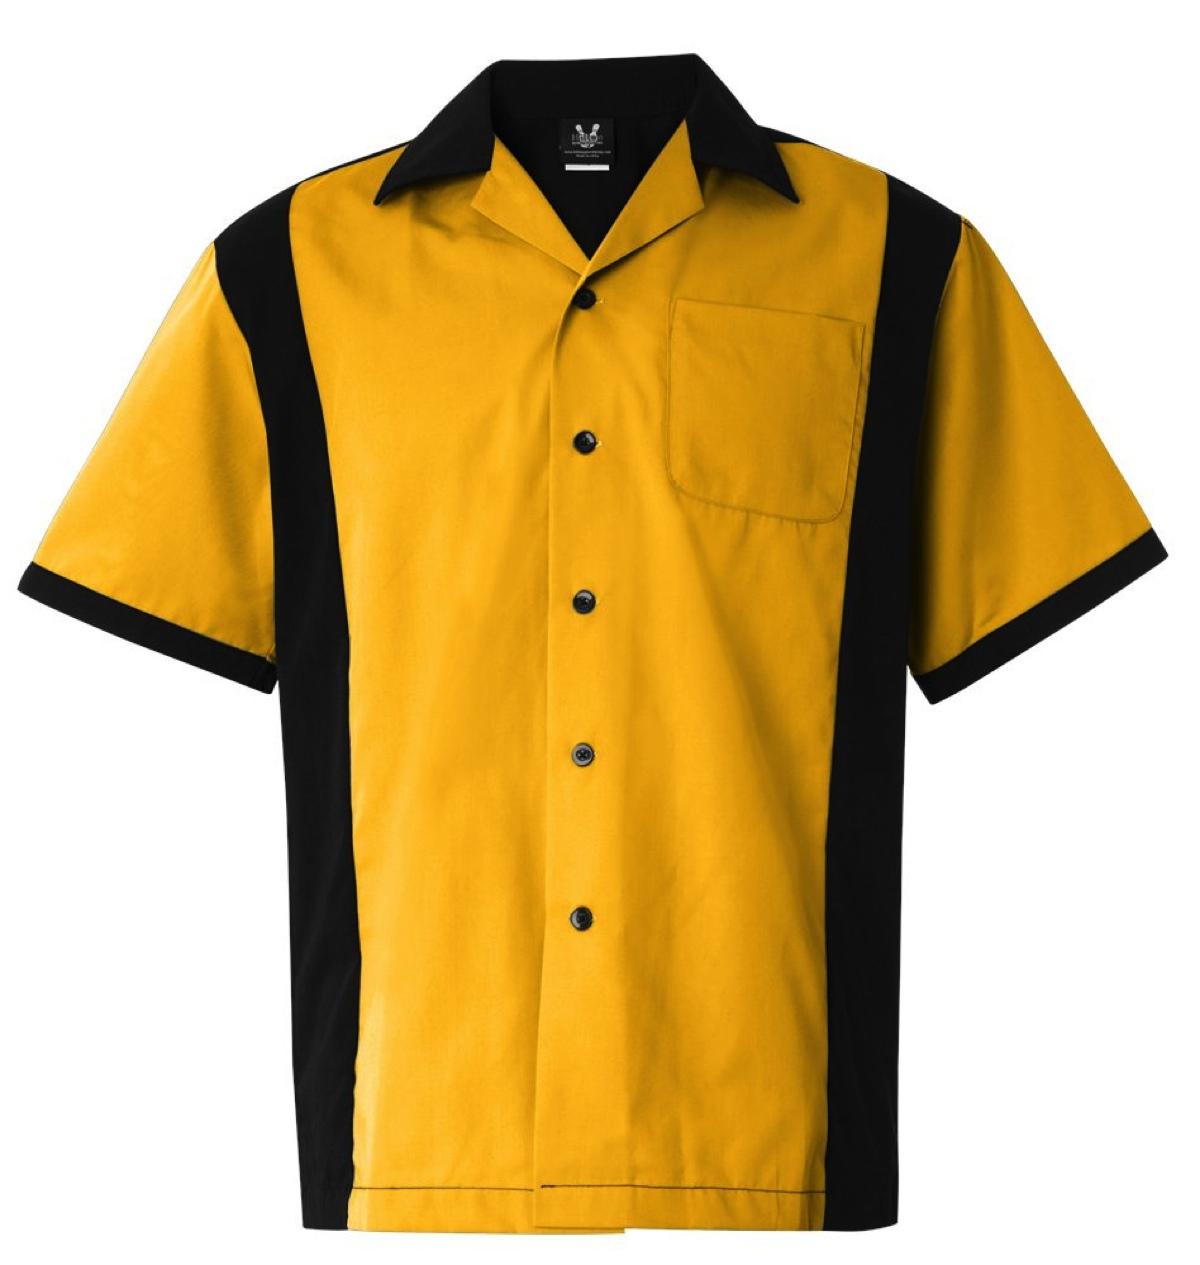 Custom Embroidered Hp2243 Hilton Cruiser Bowling Shirt